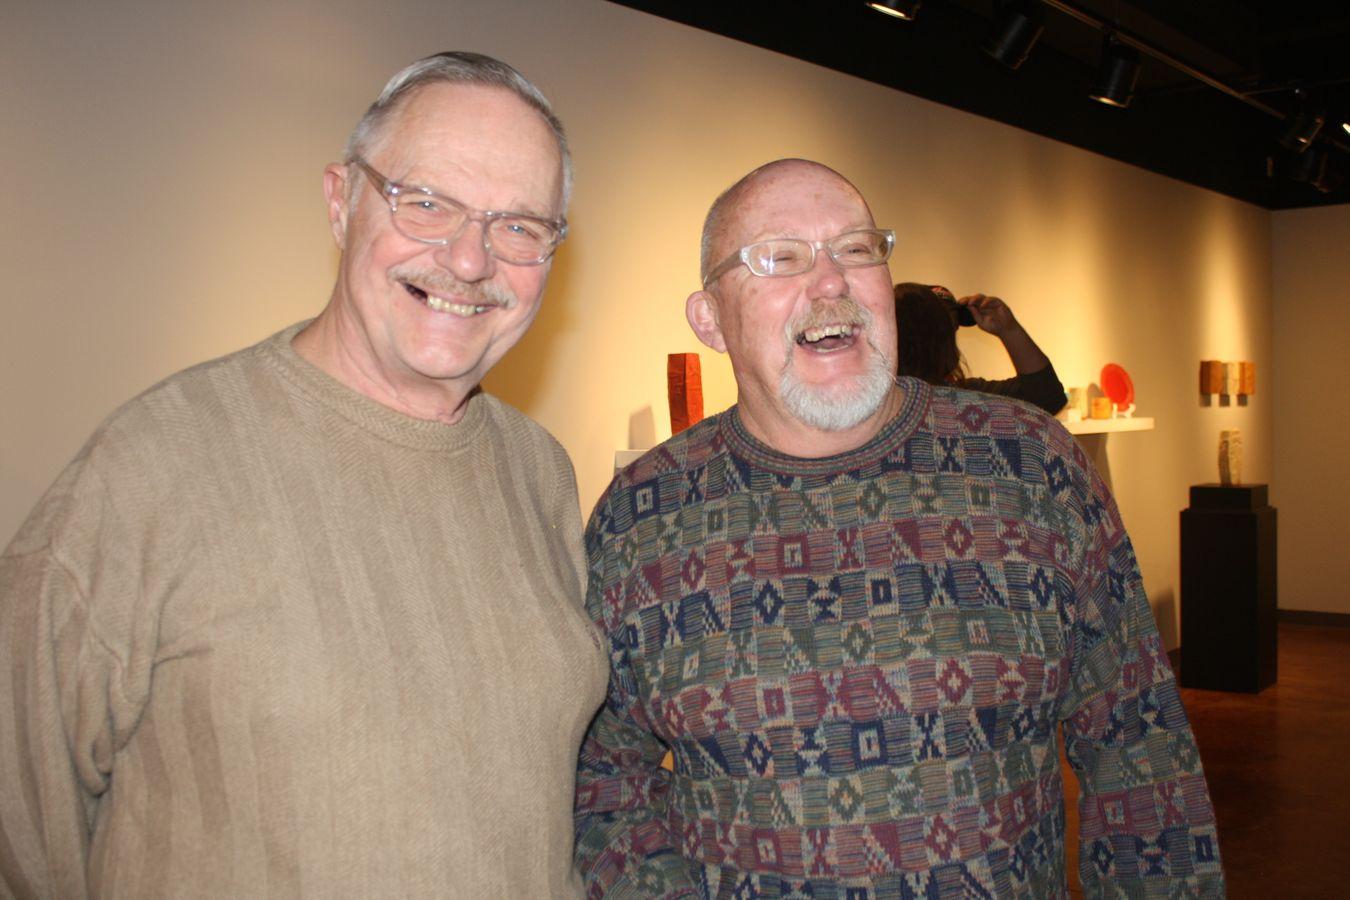 Tim & Randy Arand-Mcllrath